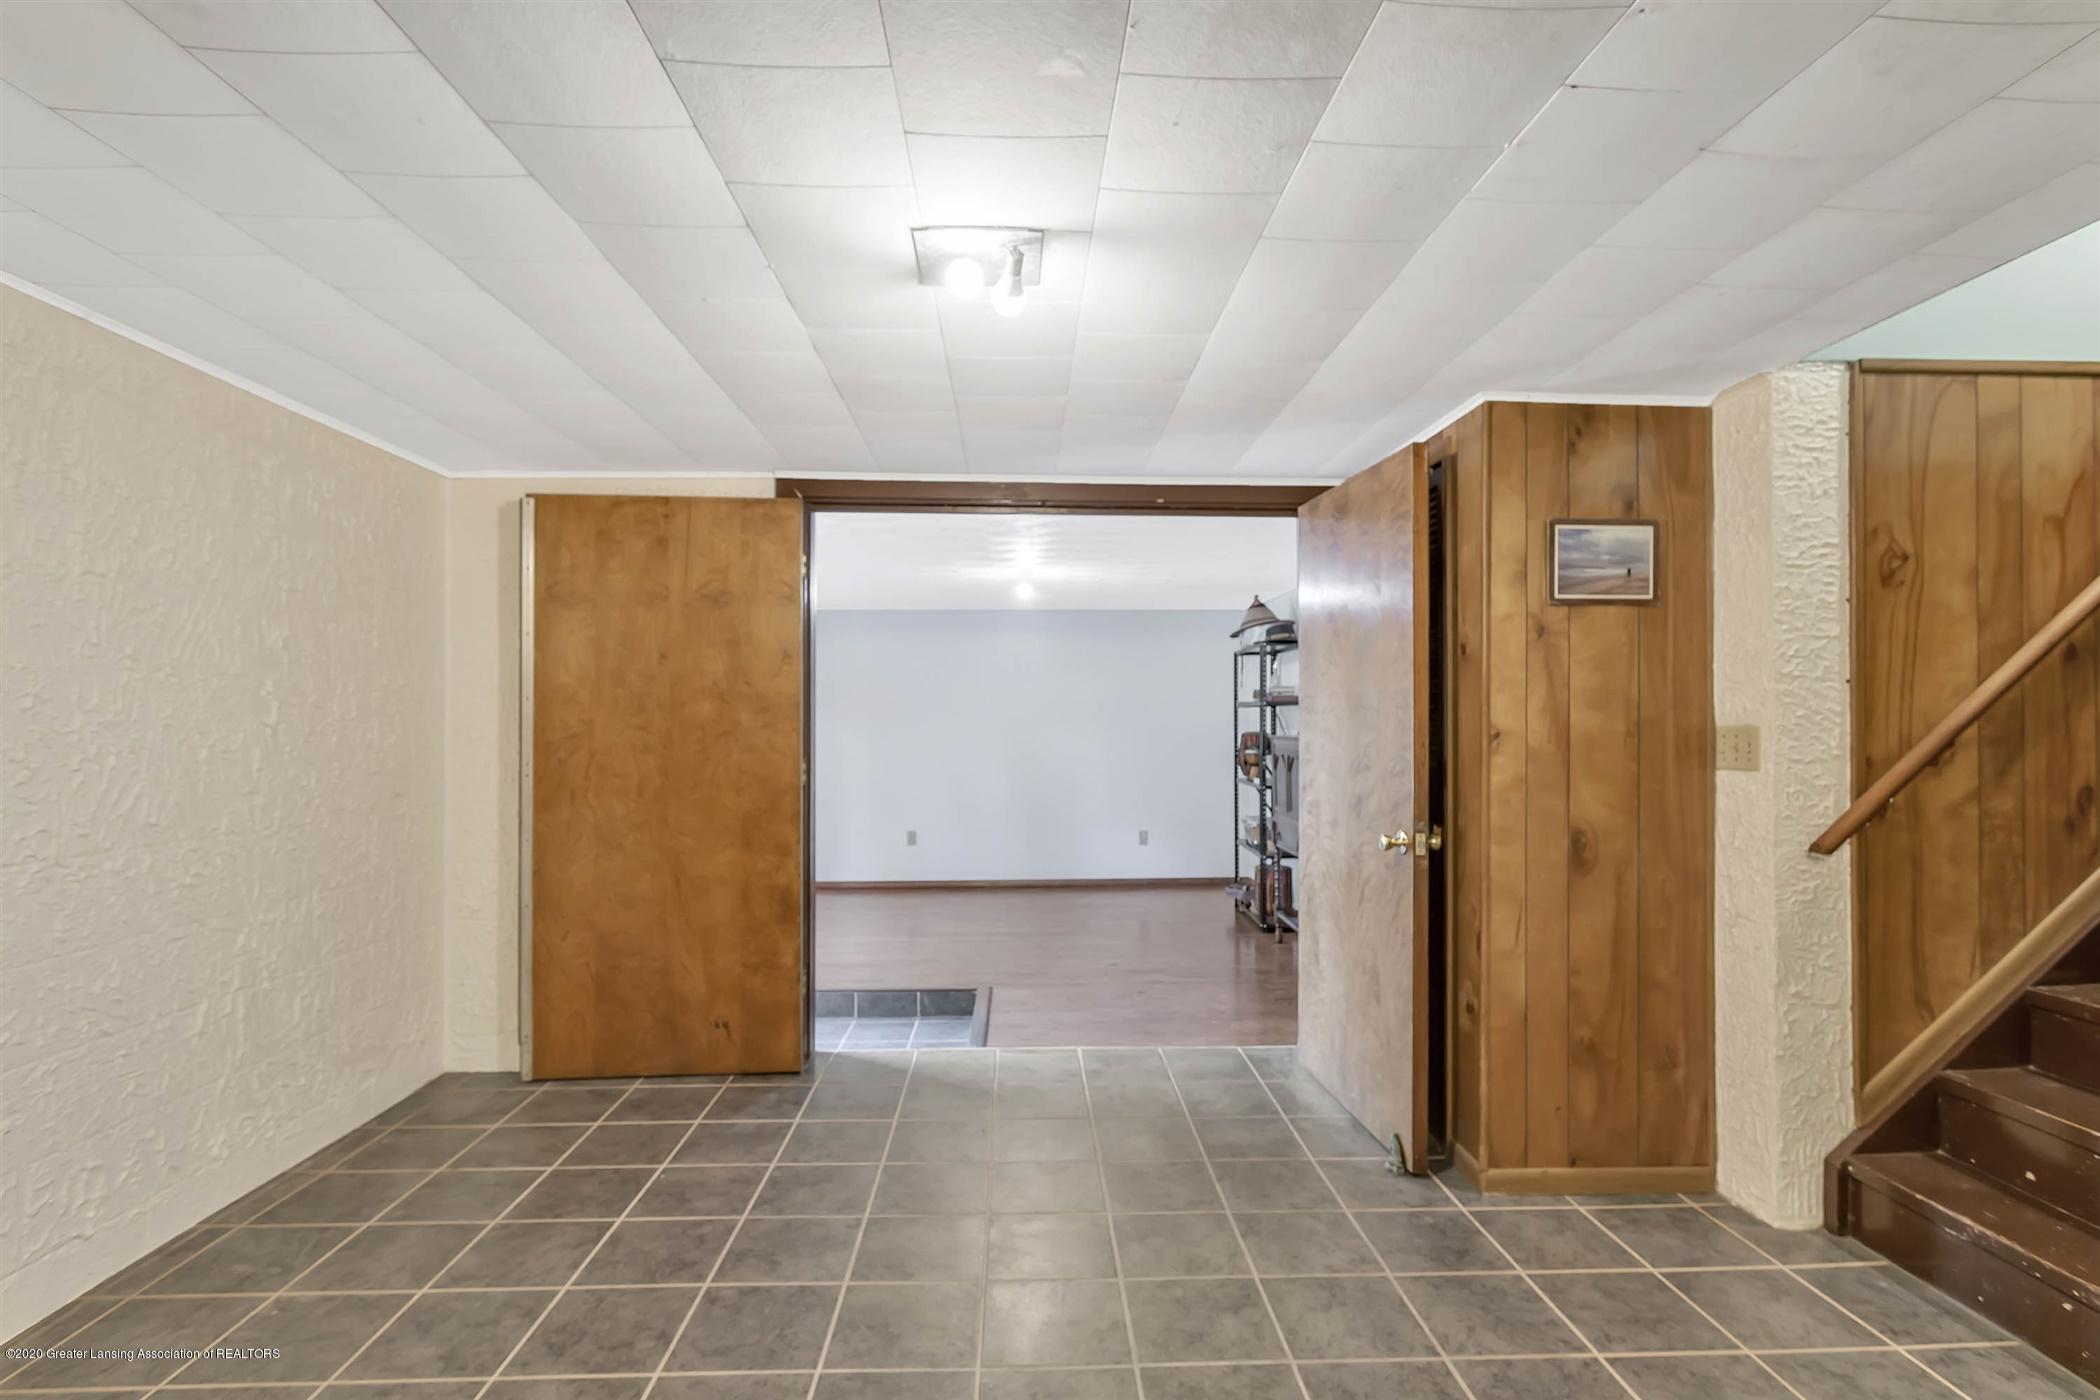 5110 E Clark Rd - 35-5110 Clark Rd-WindowStill-Real-E - 35